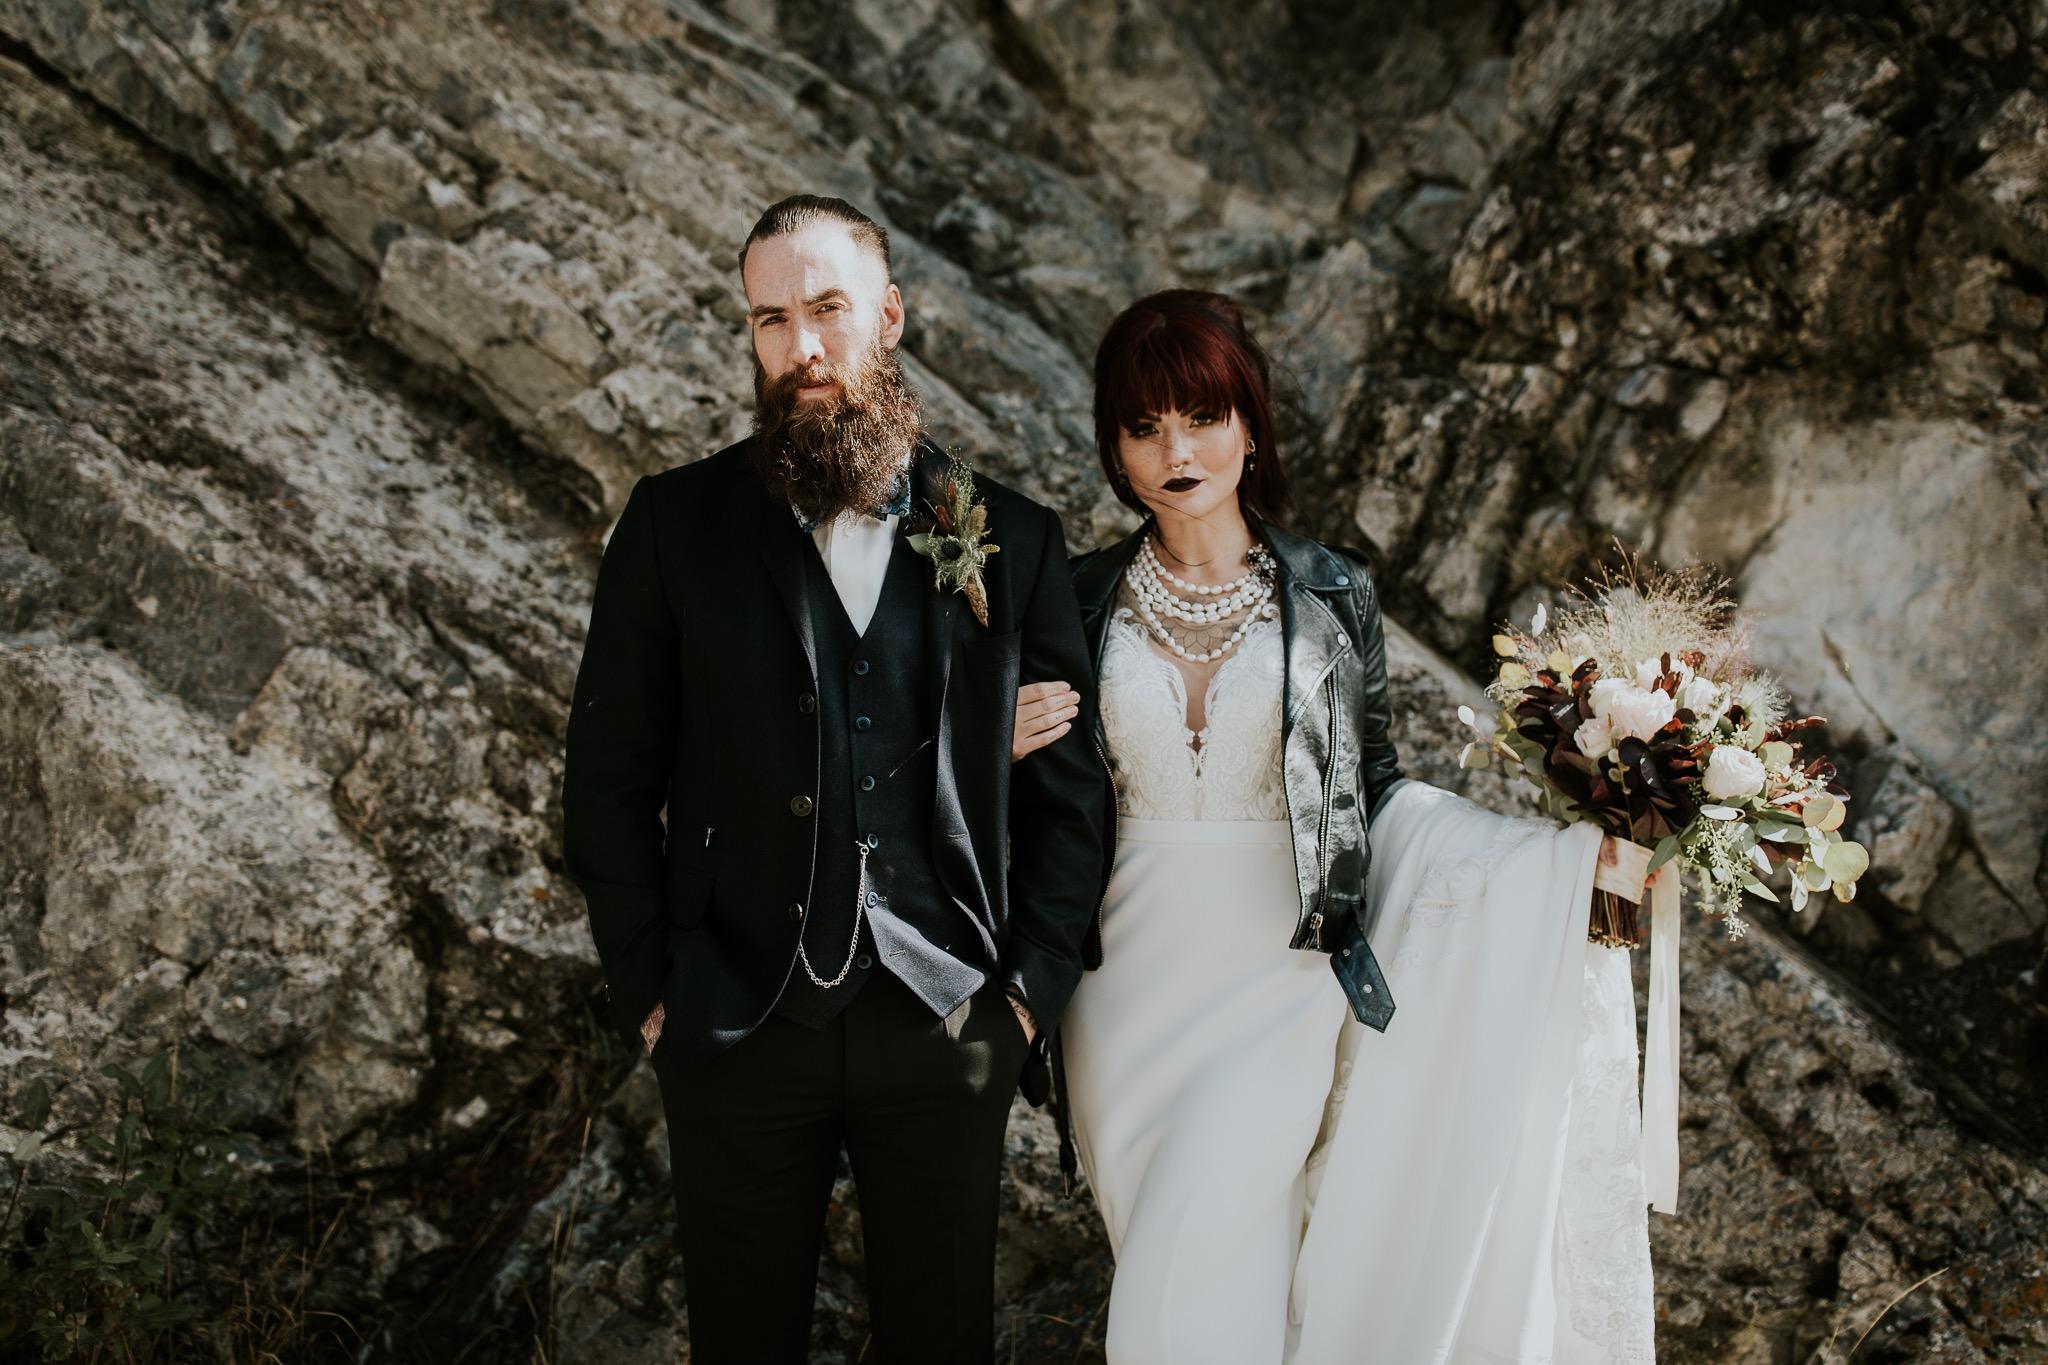 20170915-canmore-moody-wedding-photographer-creekside-creeksidestyledshoot-time&fate-5242